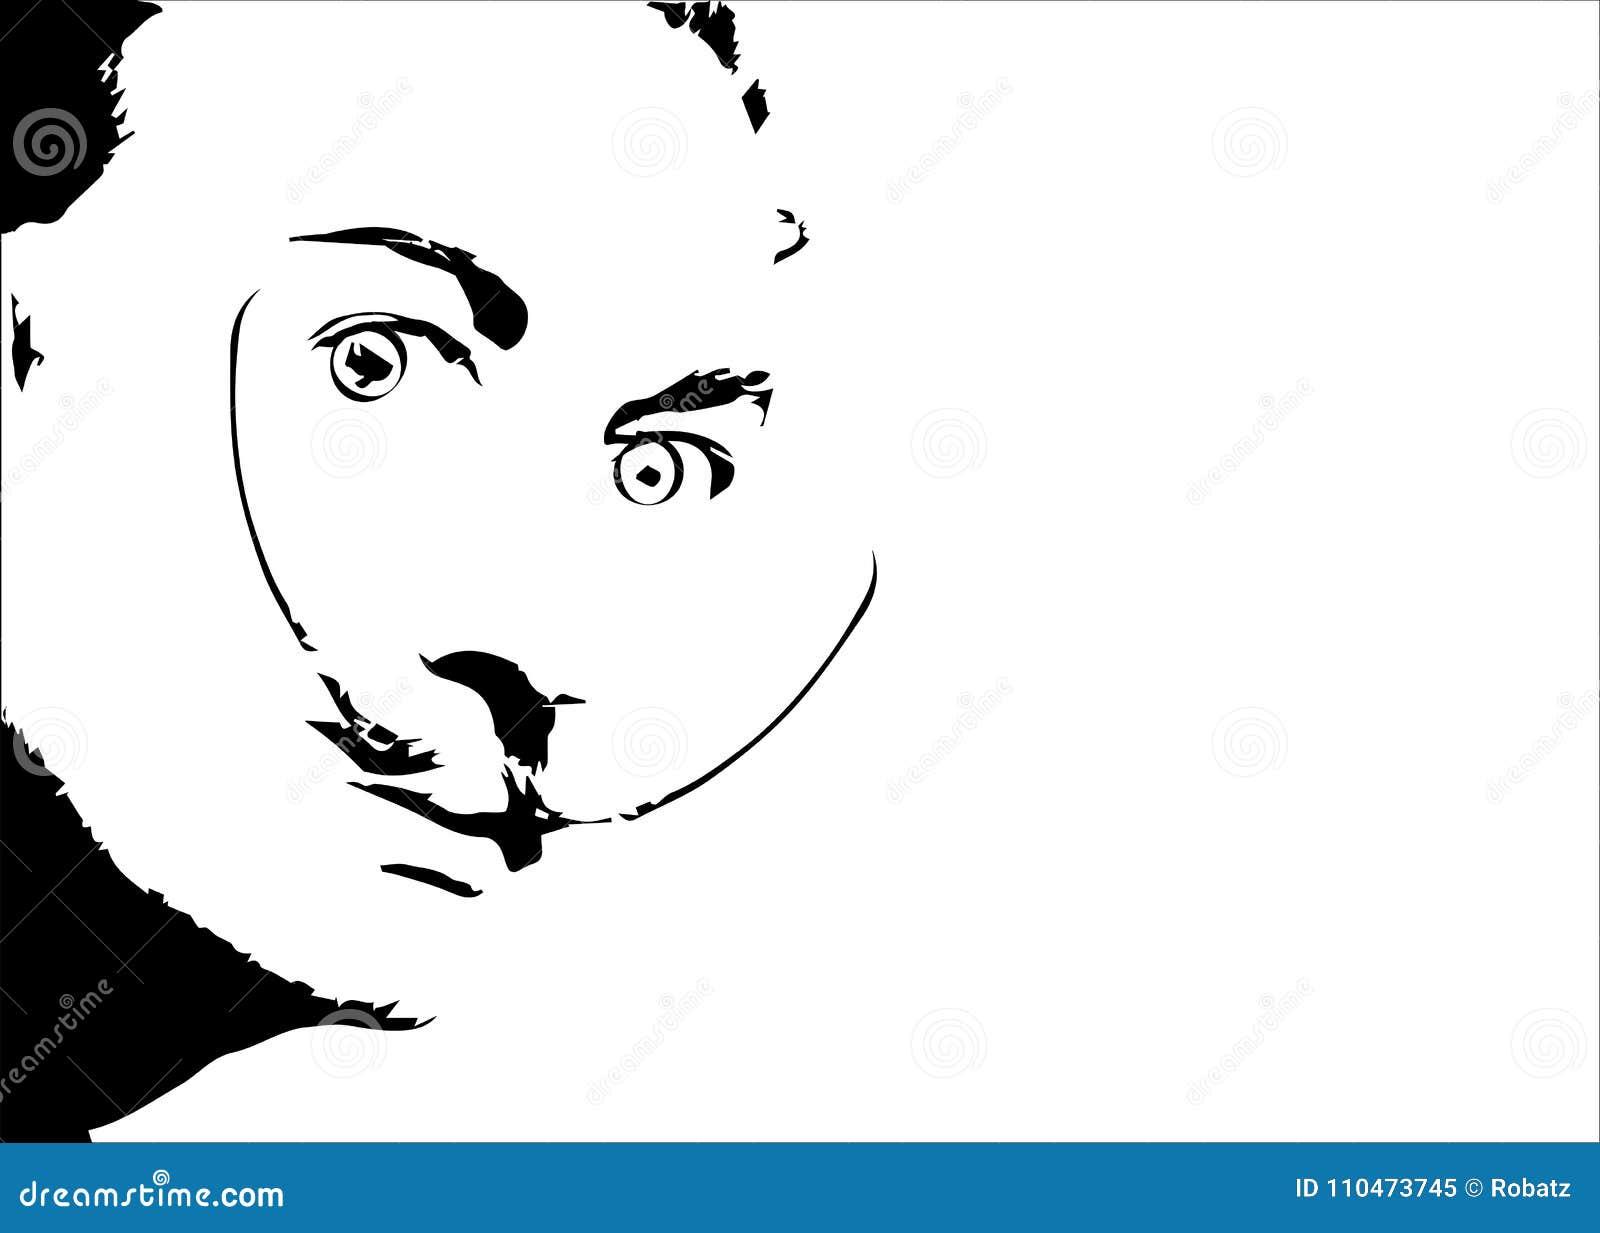 Retrato do vetor do ` de Salvador Dali, gráficos mínimos isolados ou fundo branco